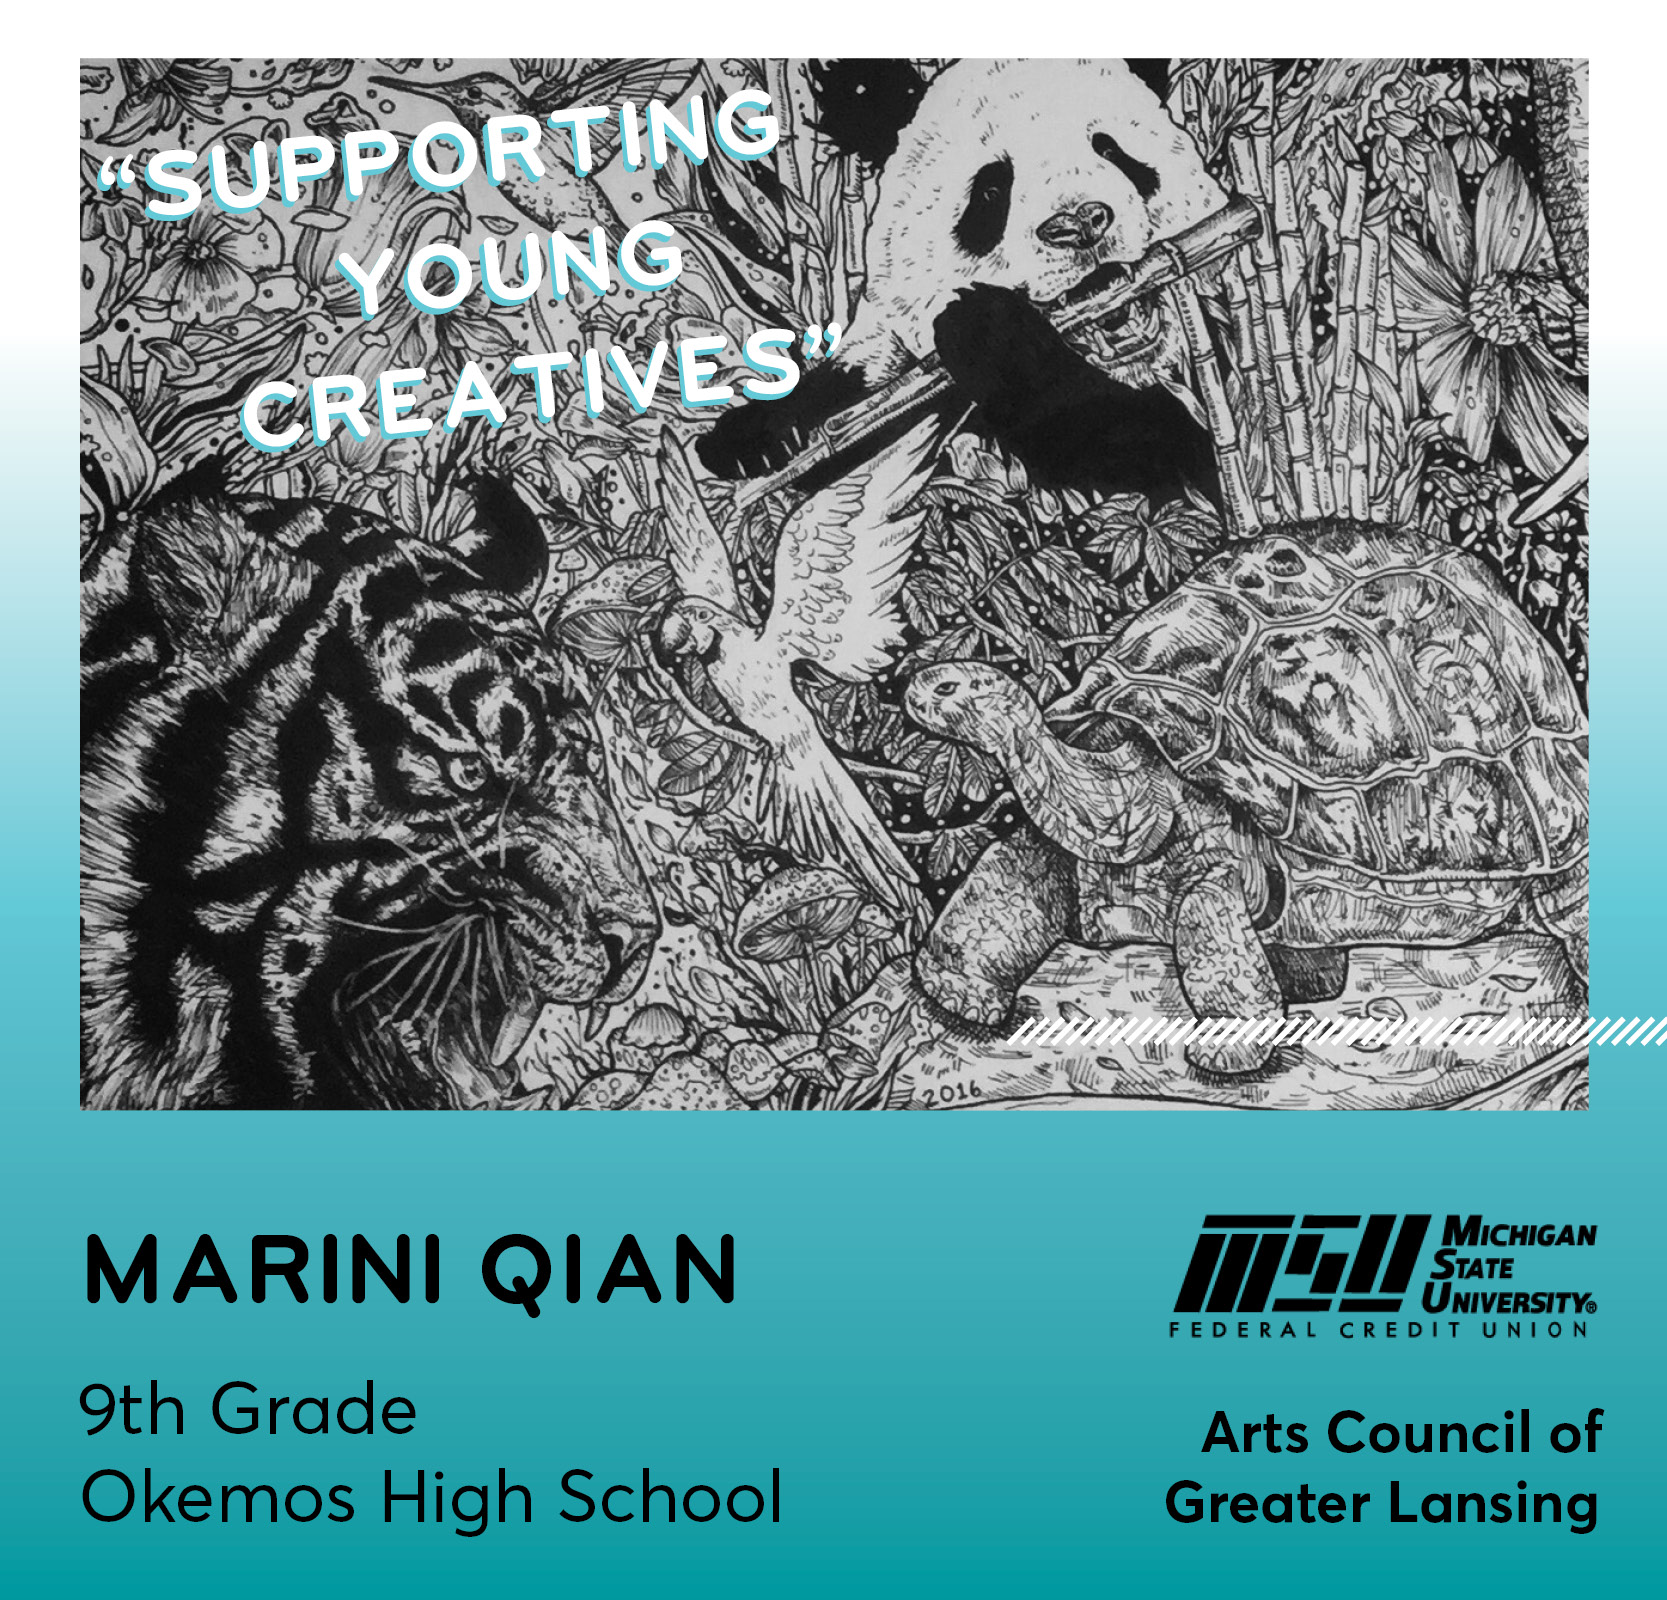 Marini Qian Billboard